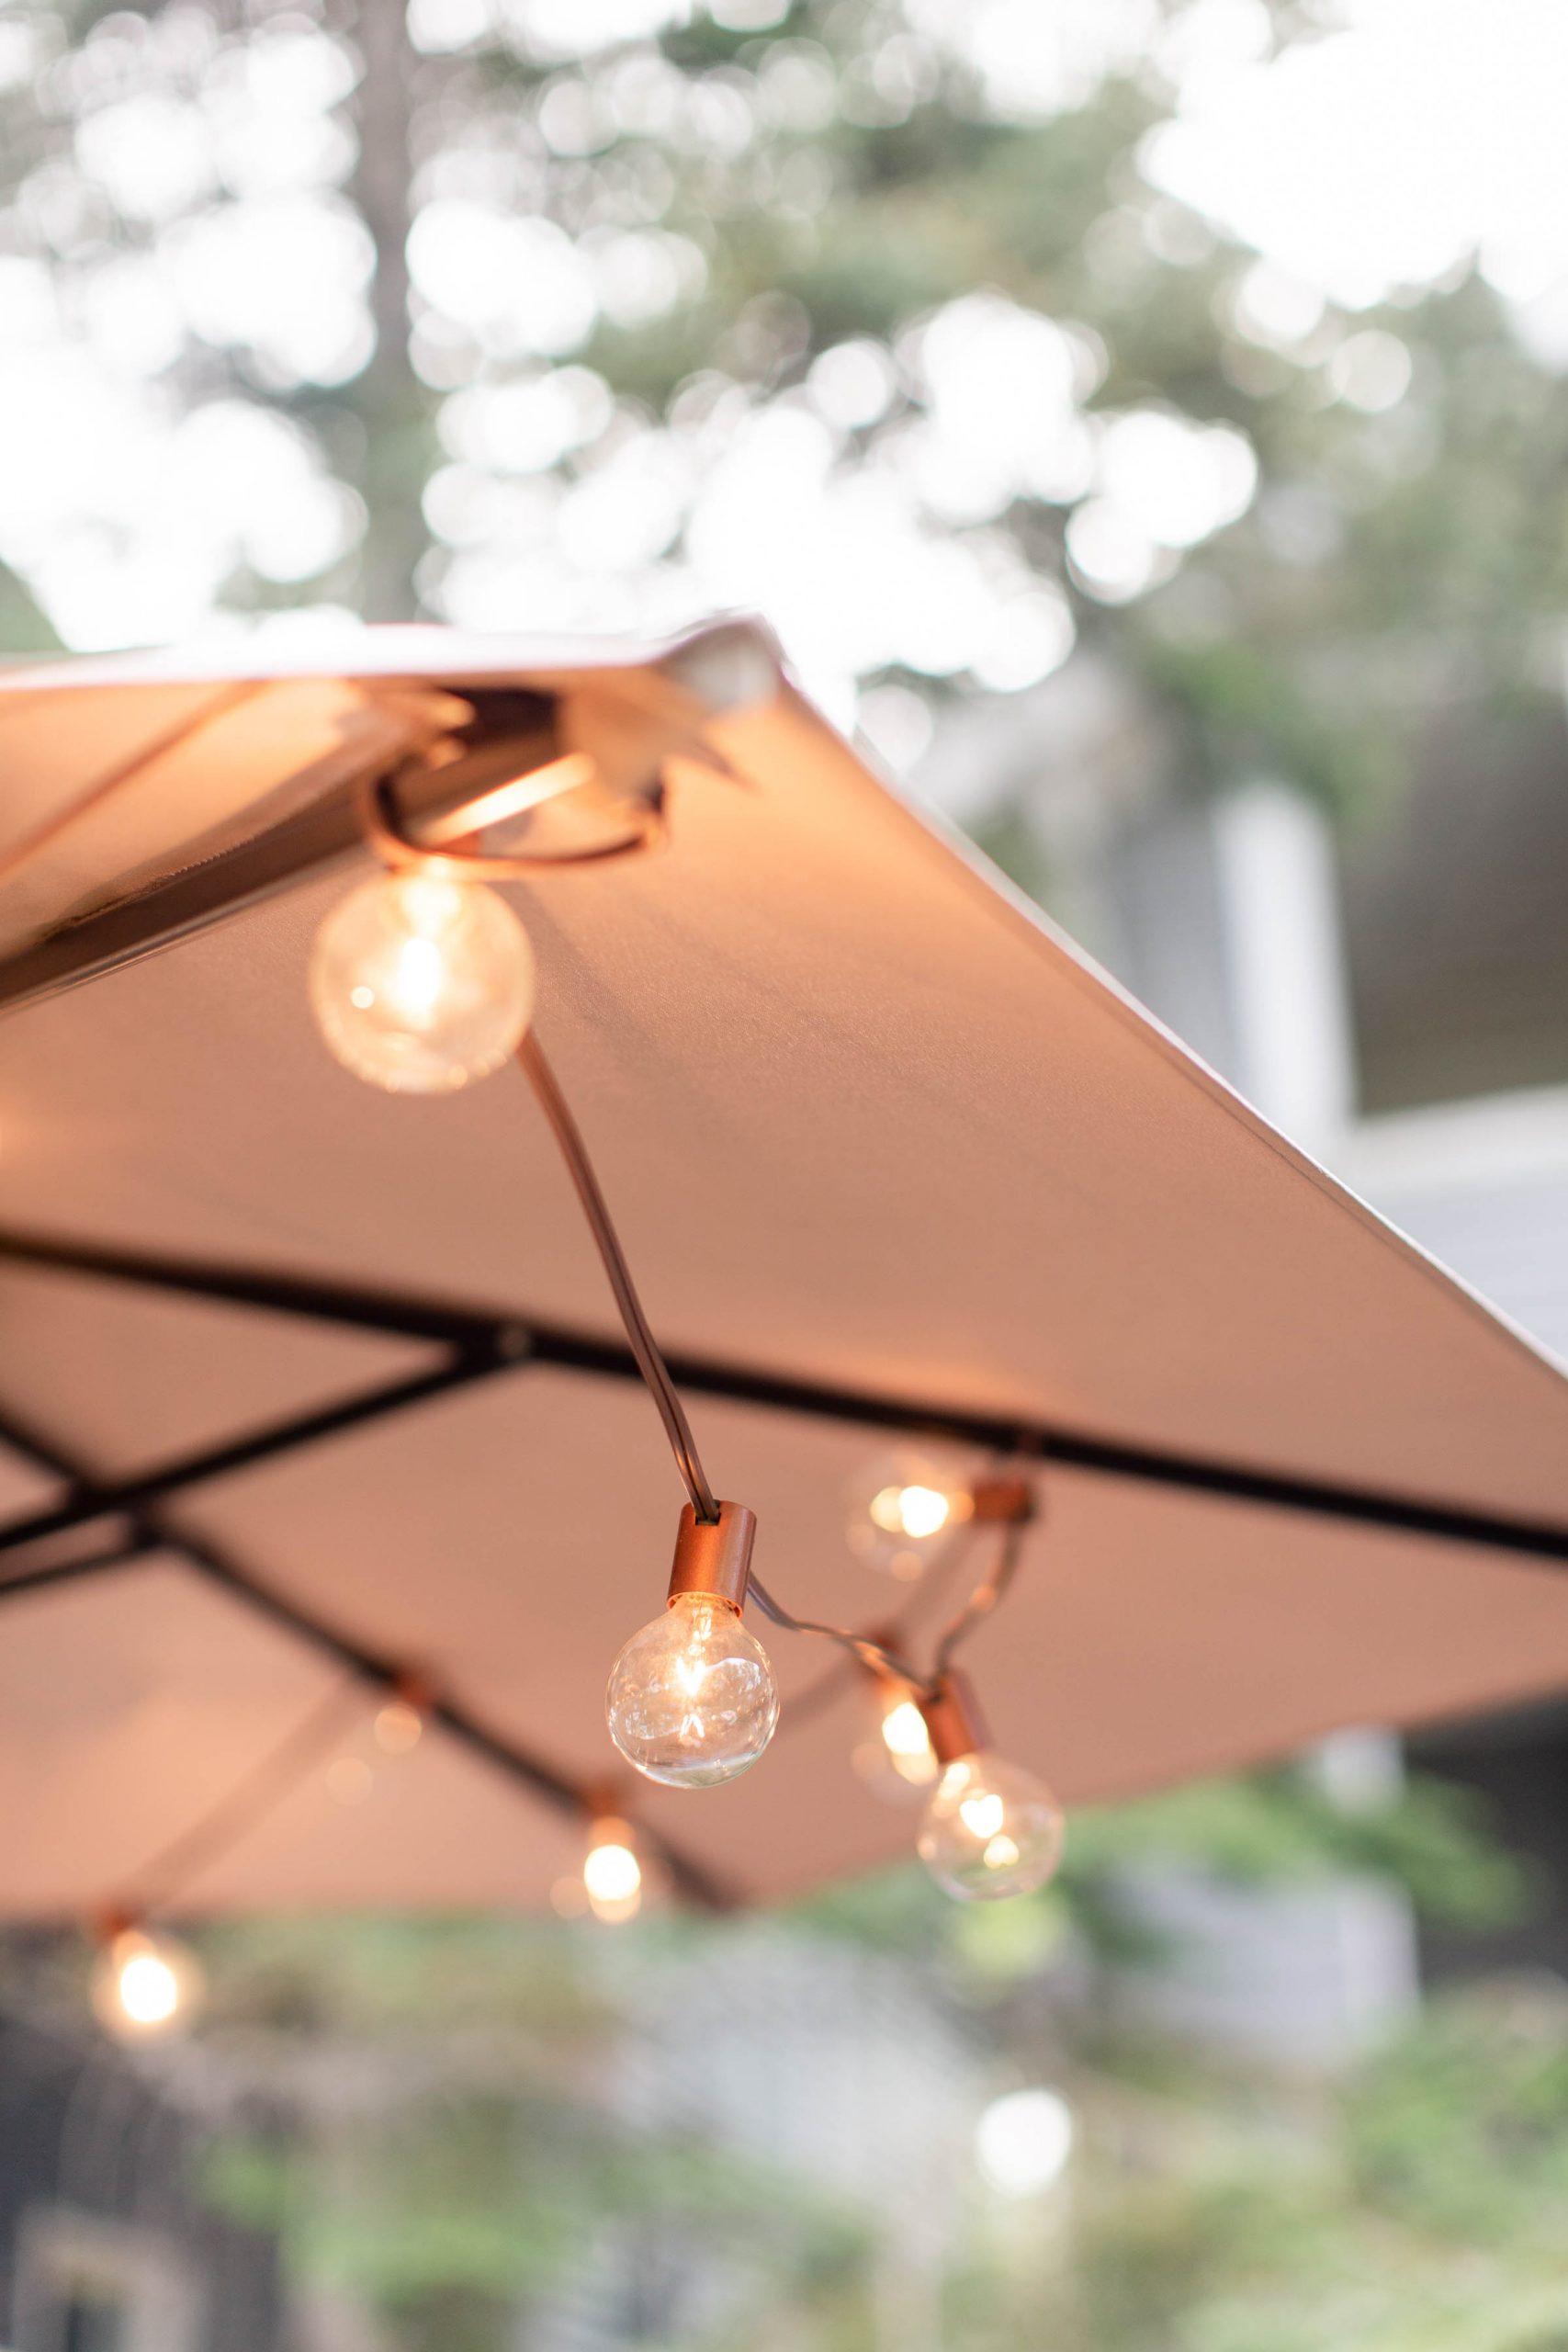 mini bulb lights strung through patio umbrella